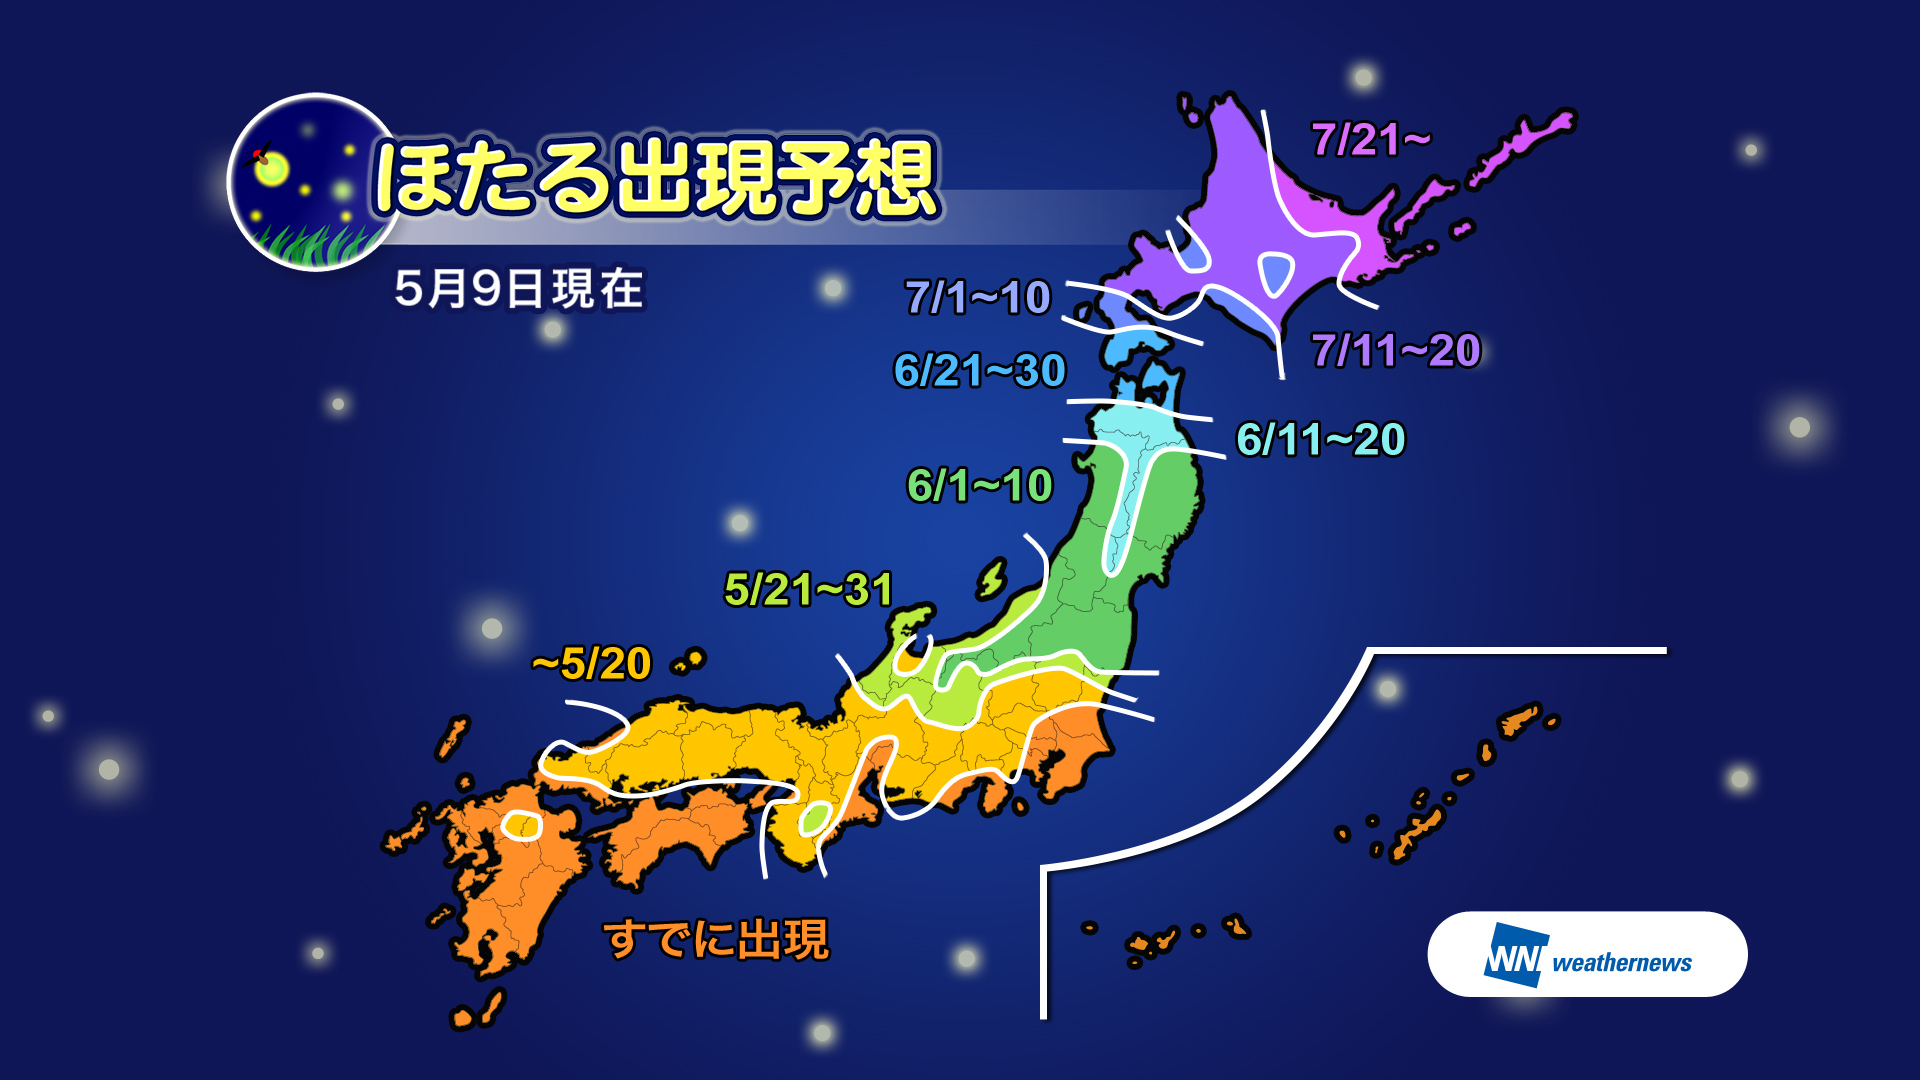 https://jp.weathernews.com/wp-content/uploads/2018/05/hotaru20180510_1.jpg